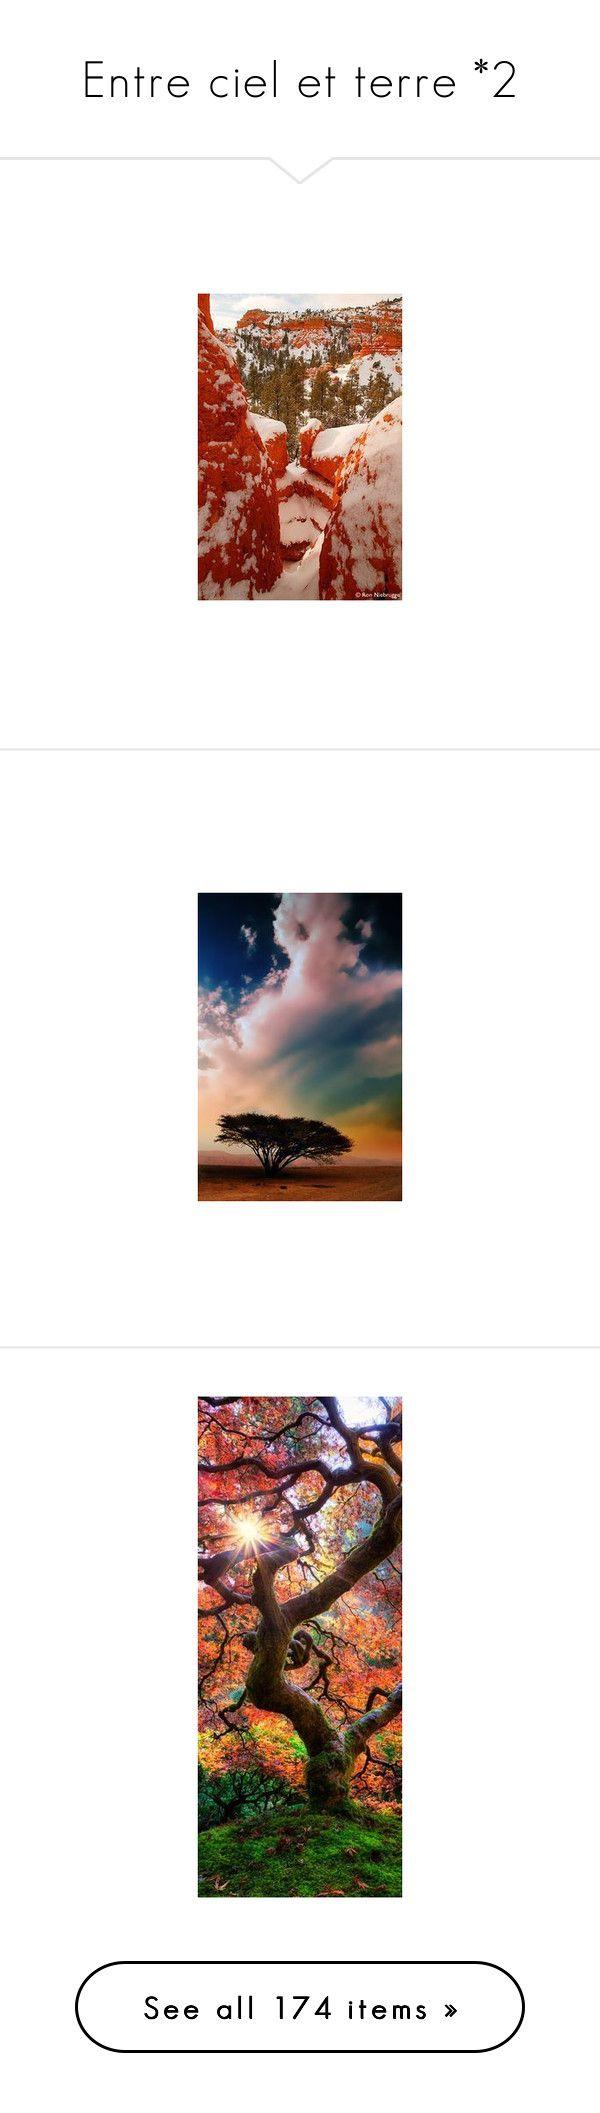 """Entre ciel et terre *2"" by insoumise ❤ liked on Polyvore featuring home, home decor, backgrounds, landscape, pictures, accessories, samsung, purple home decor, purple home accessories and southwestern home decor"